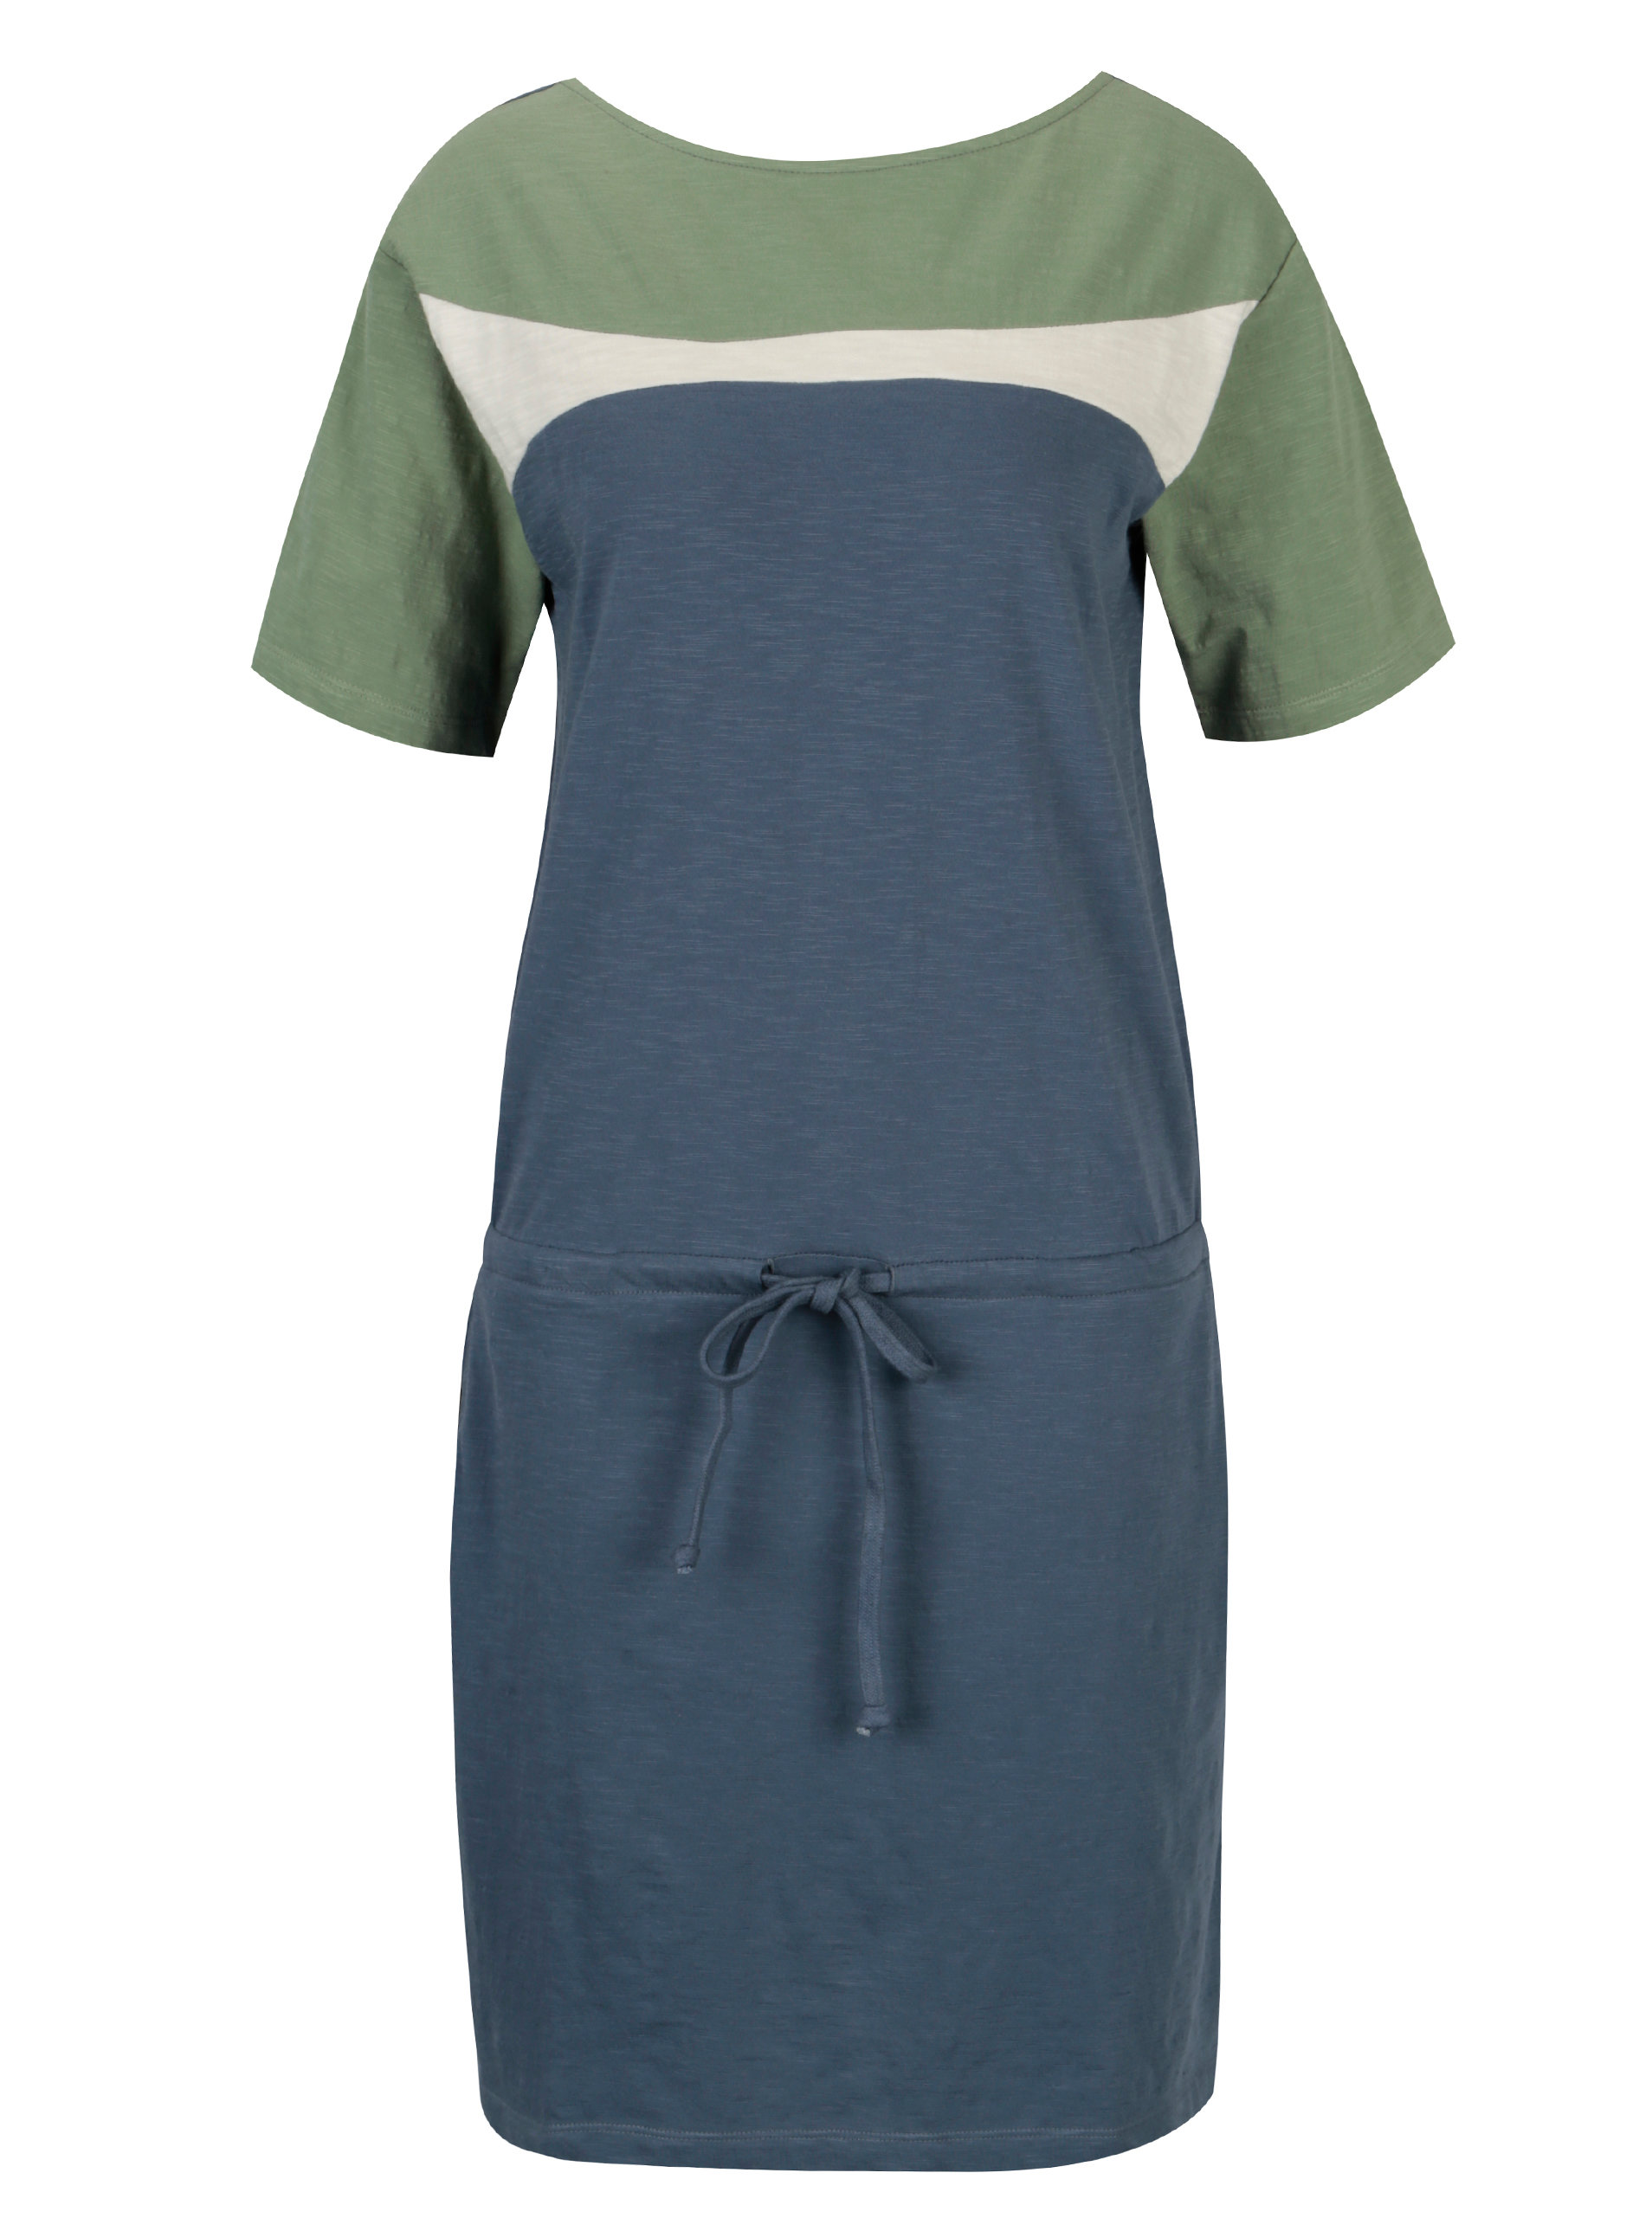 4b6a9a8ba190 Zeleno-modré šaty Tranquillo Lana ...